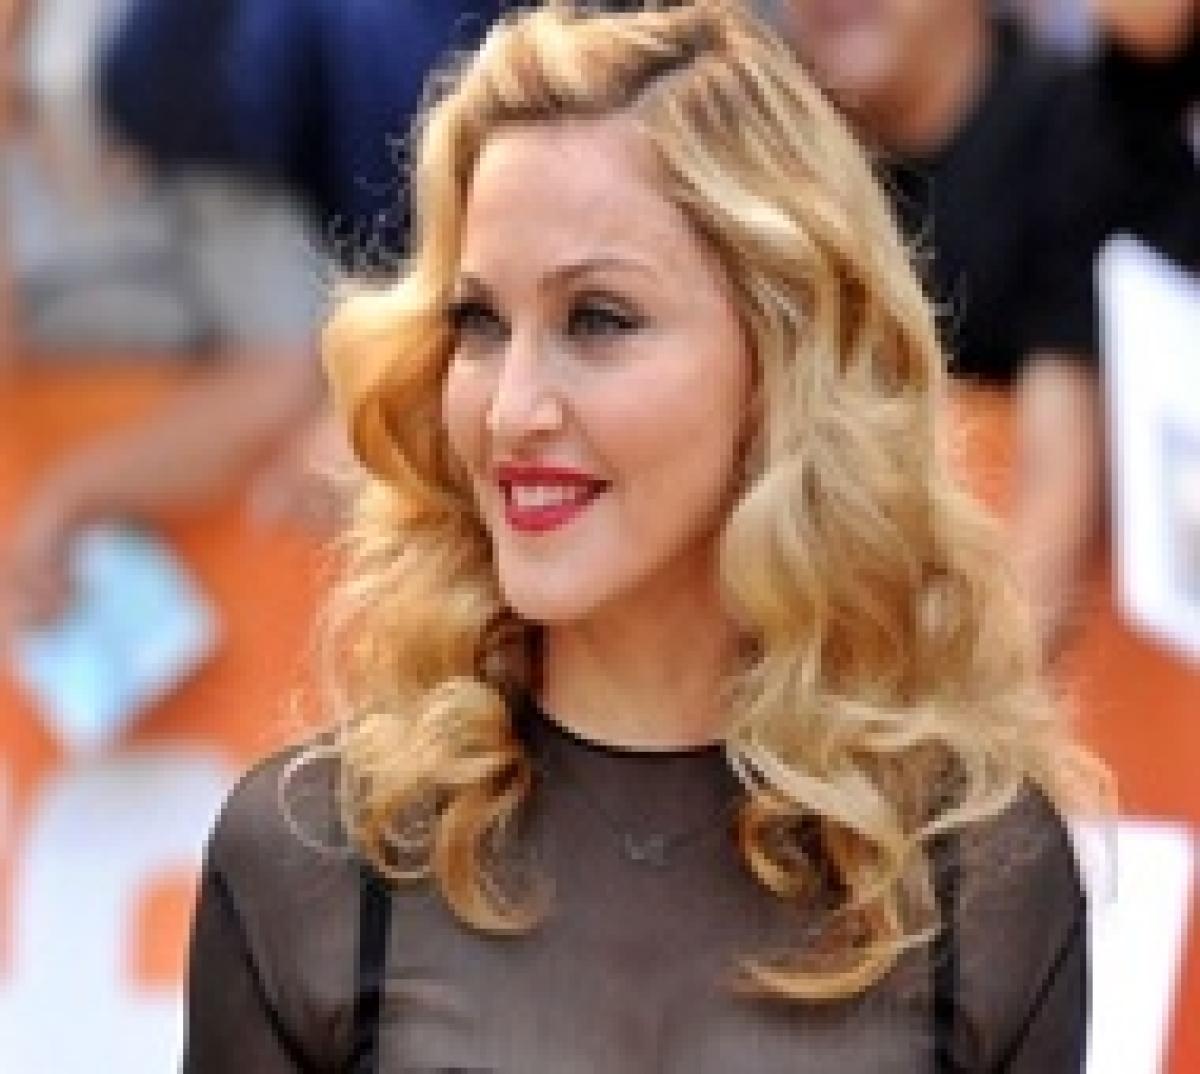 Madonna beaks down on stage